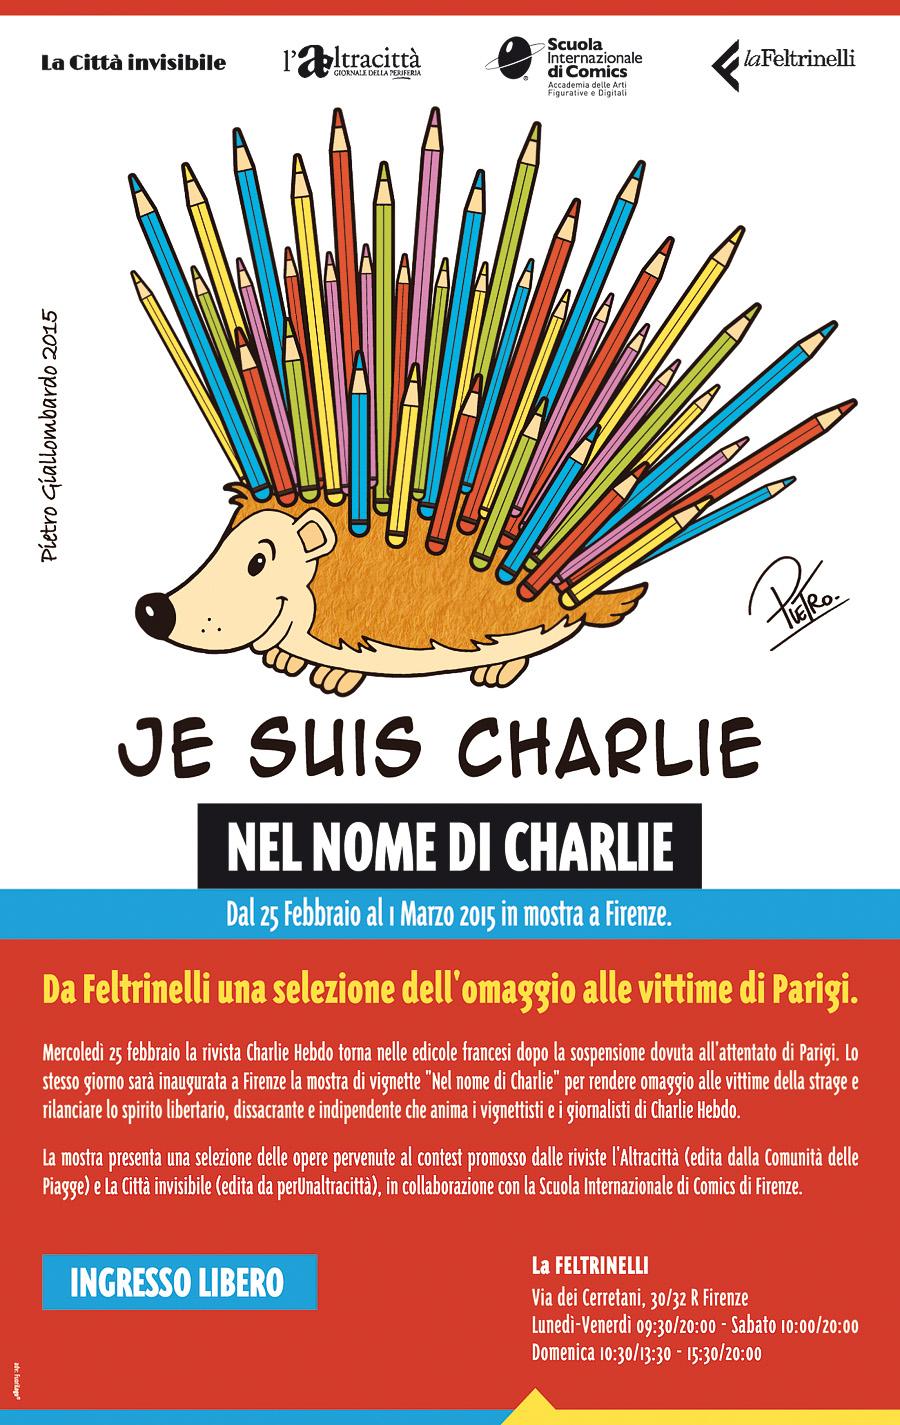 """Nel nome di Charlie"", dal 25 febbraio in mostra da Feltrinelli a Firenze"